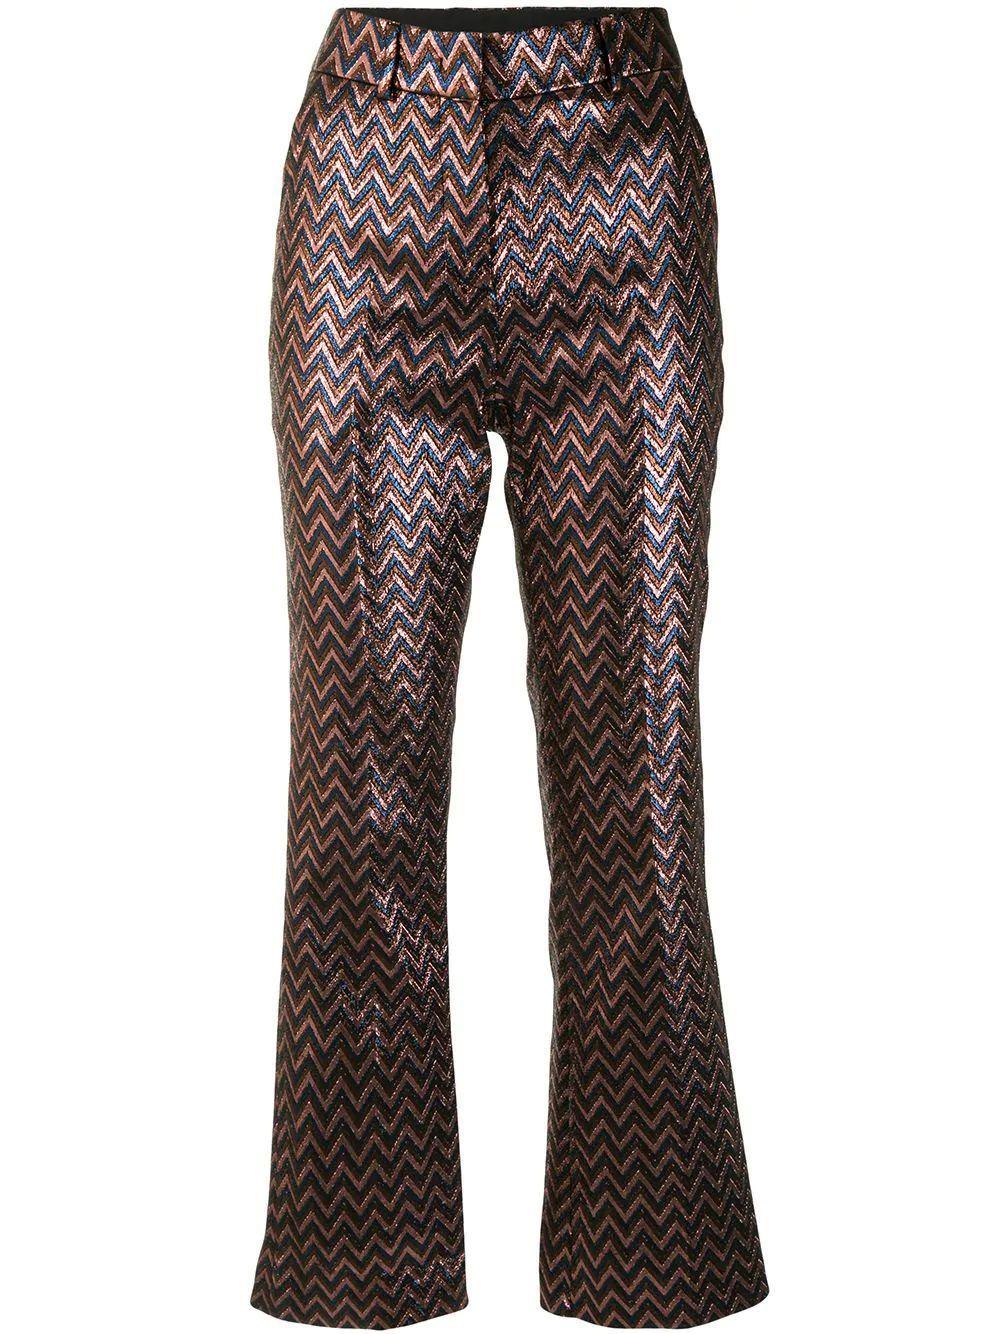 Metallic Zig Zag Pants Item # 2DI00186-2W004P